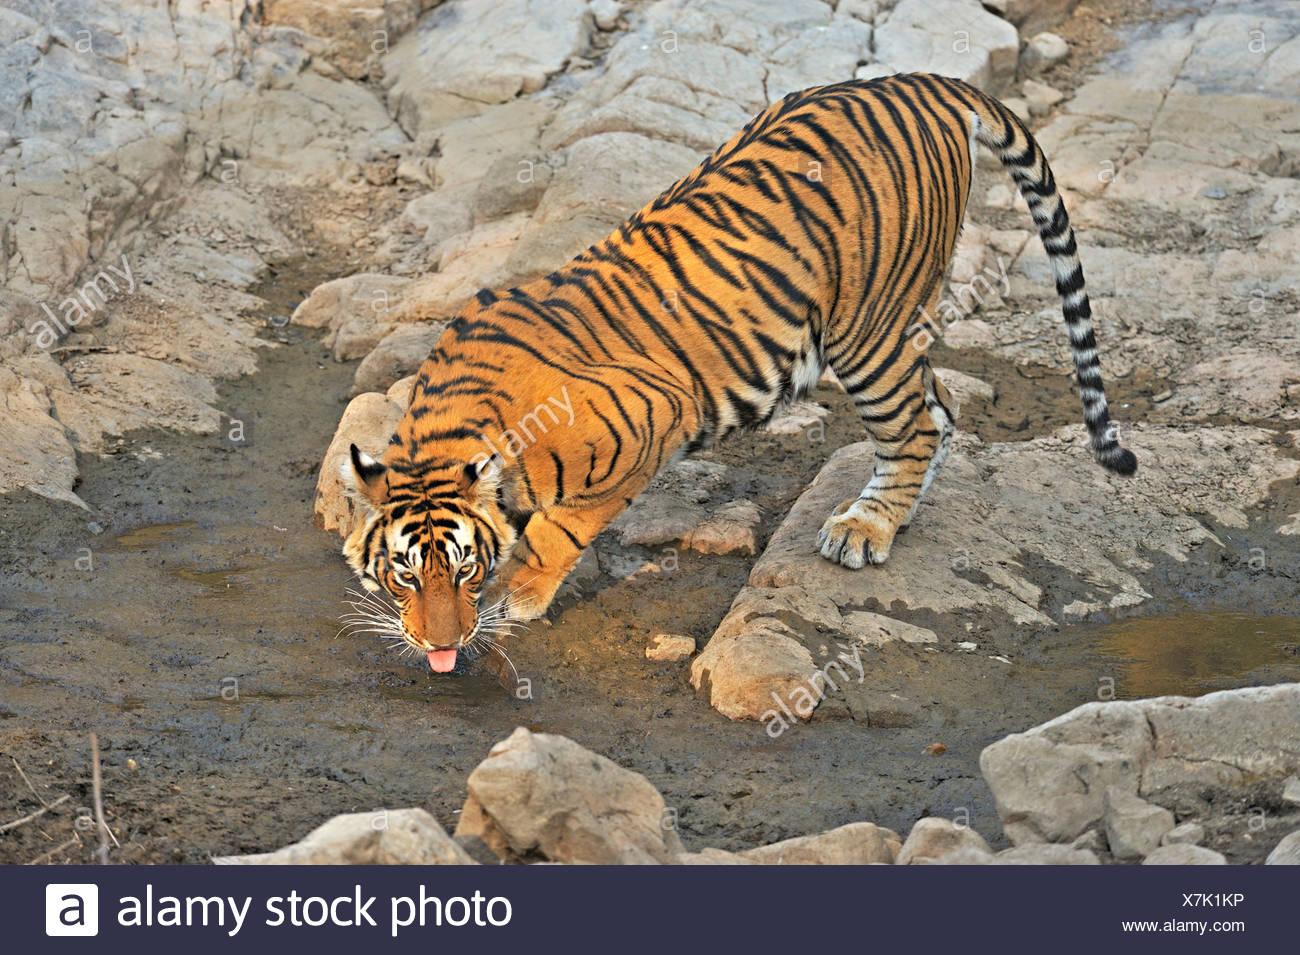 Tiger (Panthera tigris) at a rocky water hole in Ranthambore National Park, Rajasthan, India, Asia - Stock Image